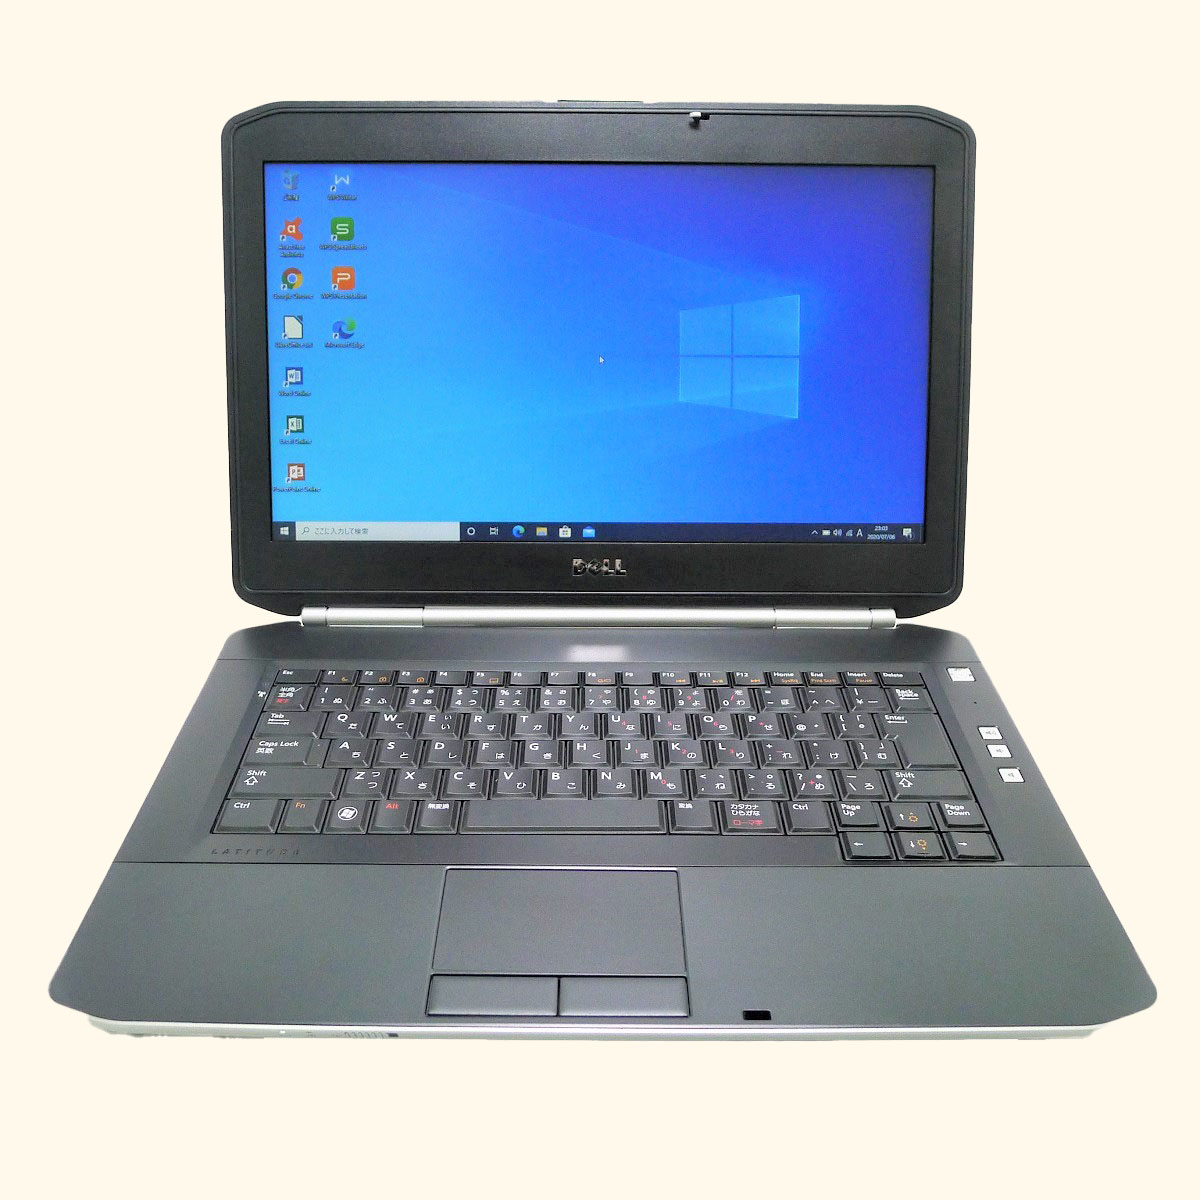 DELL Latitude E5420 Core i3 4GB HDD250GB DVD-ROM 無線LAN Windows10 64bitWPSOffice 14.0インチ HD 中古 中古パソコン 【中古】 ノートパソコン